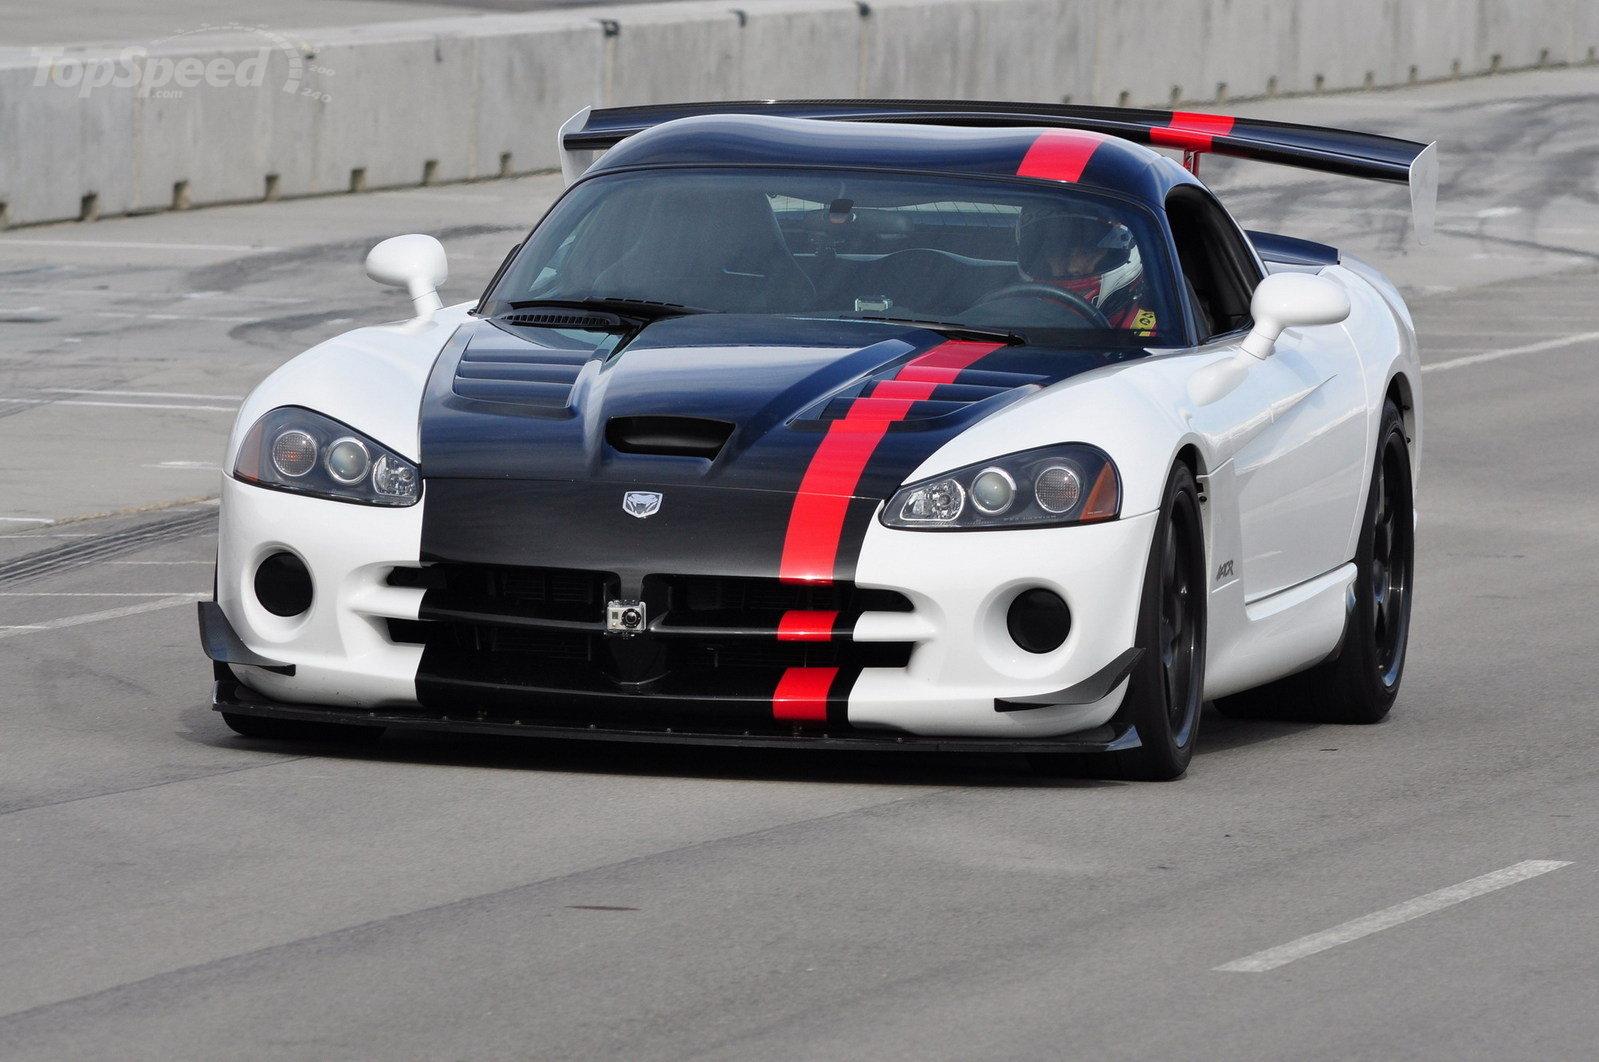 Dodge Challenger SRT Concept Wallpaper HD Car Wallpapers